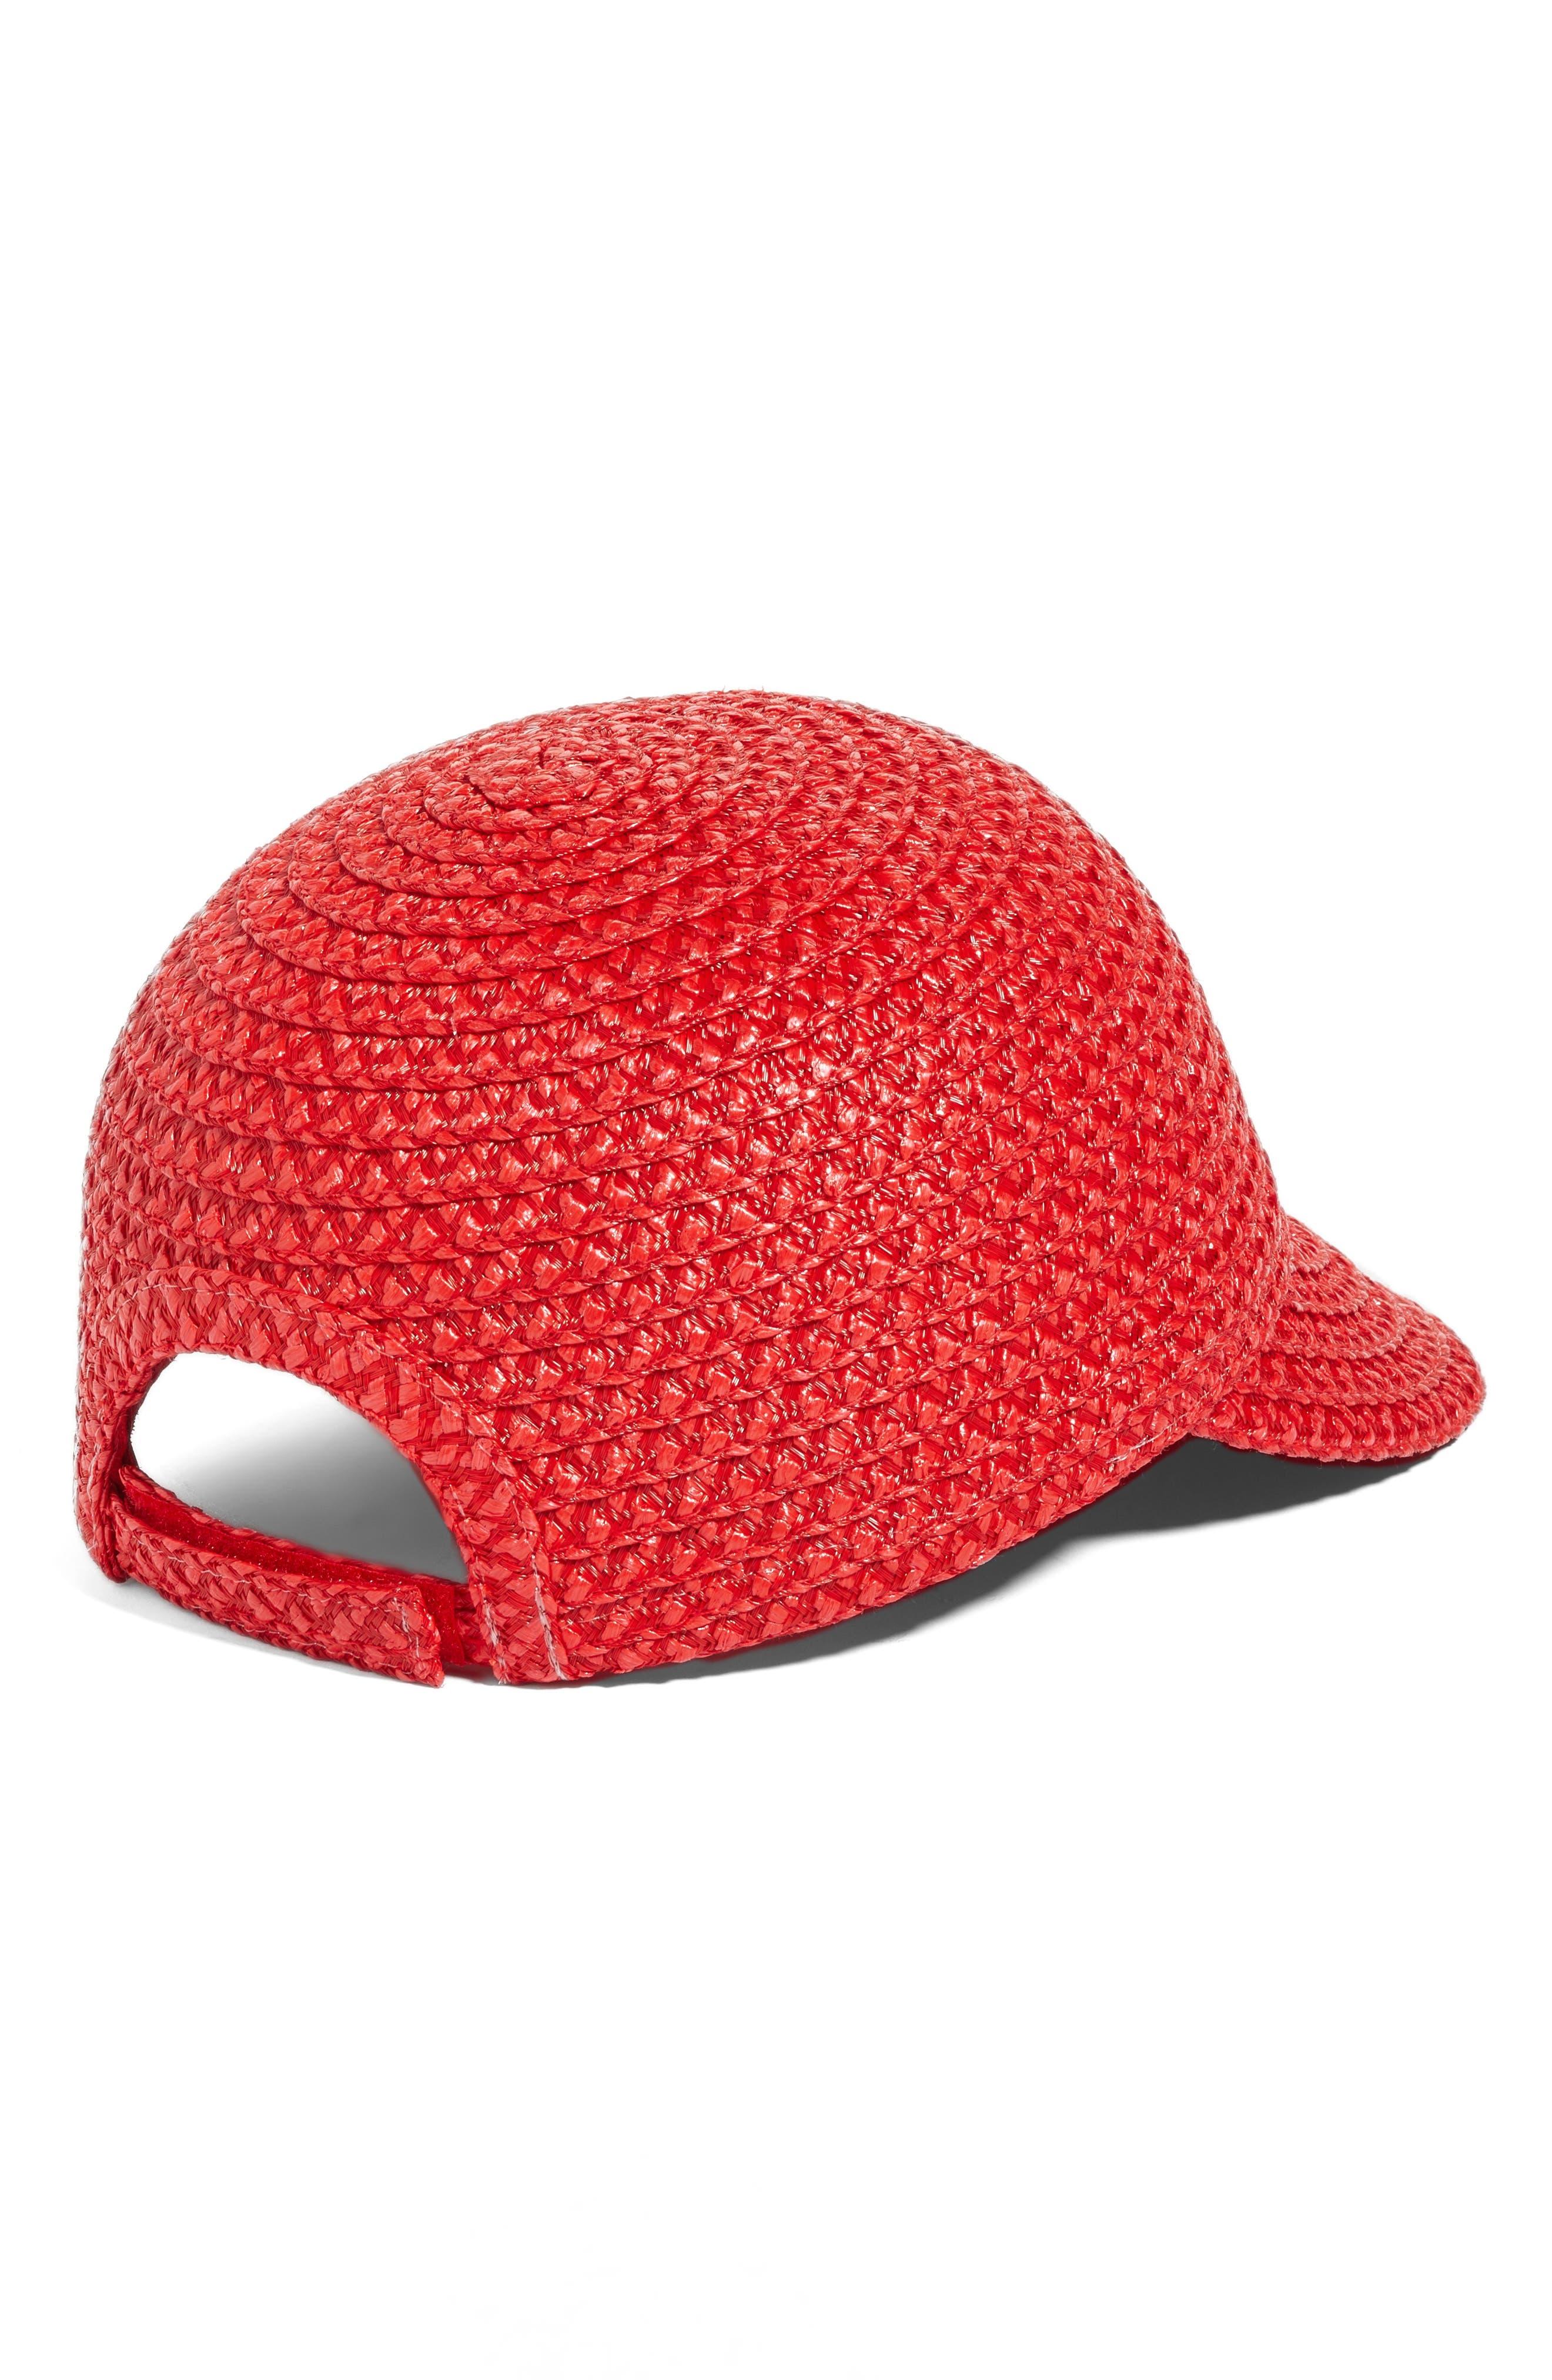 Baseball Caps  d7e73f7e5047